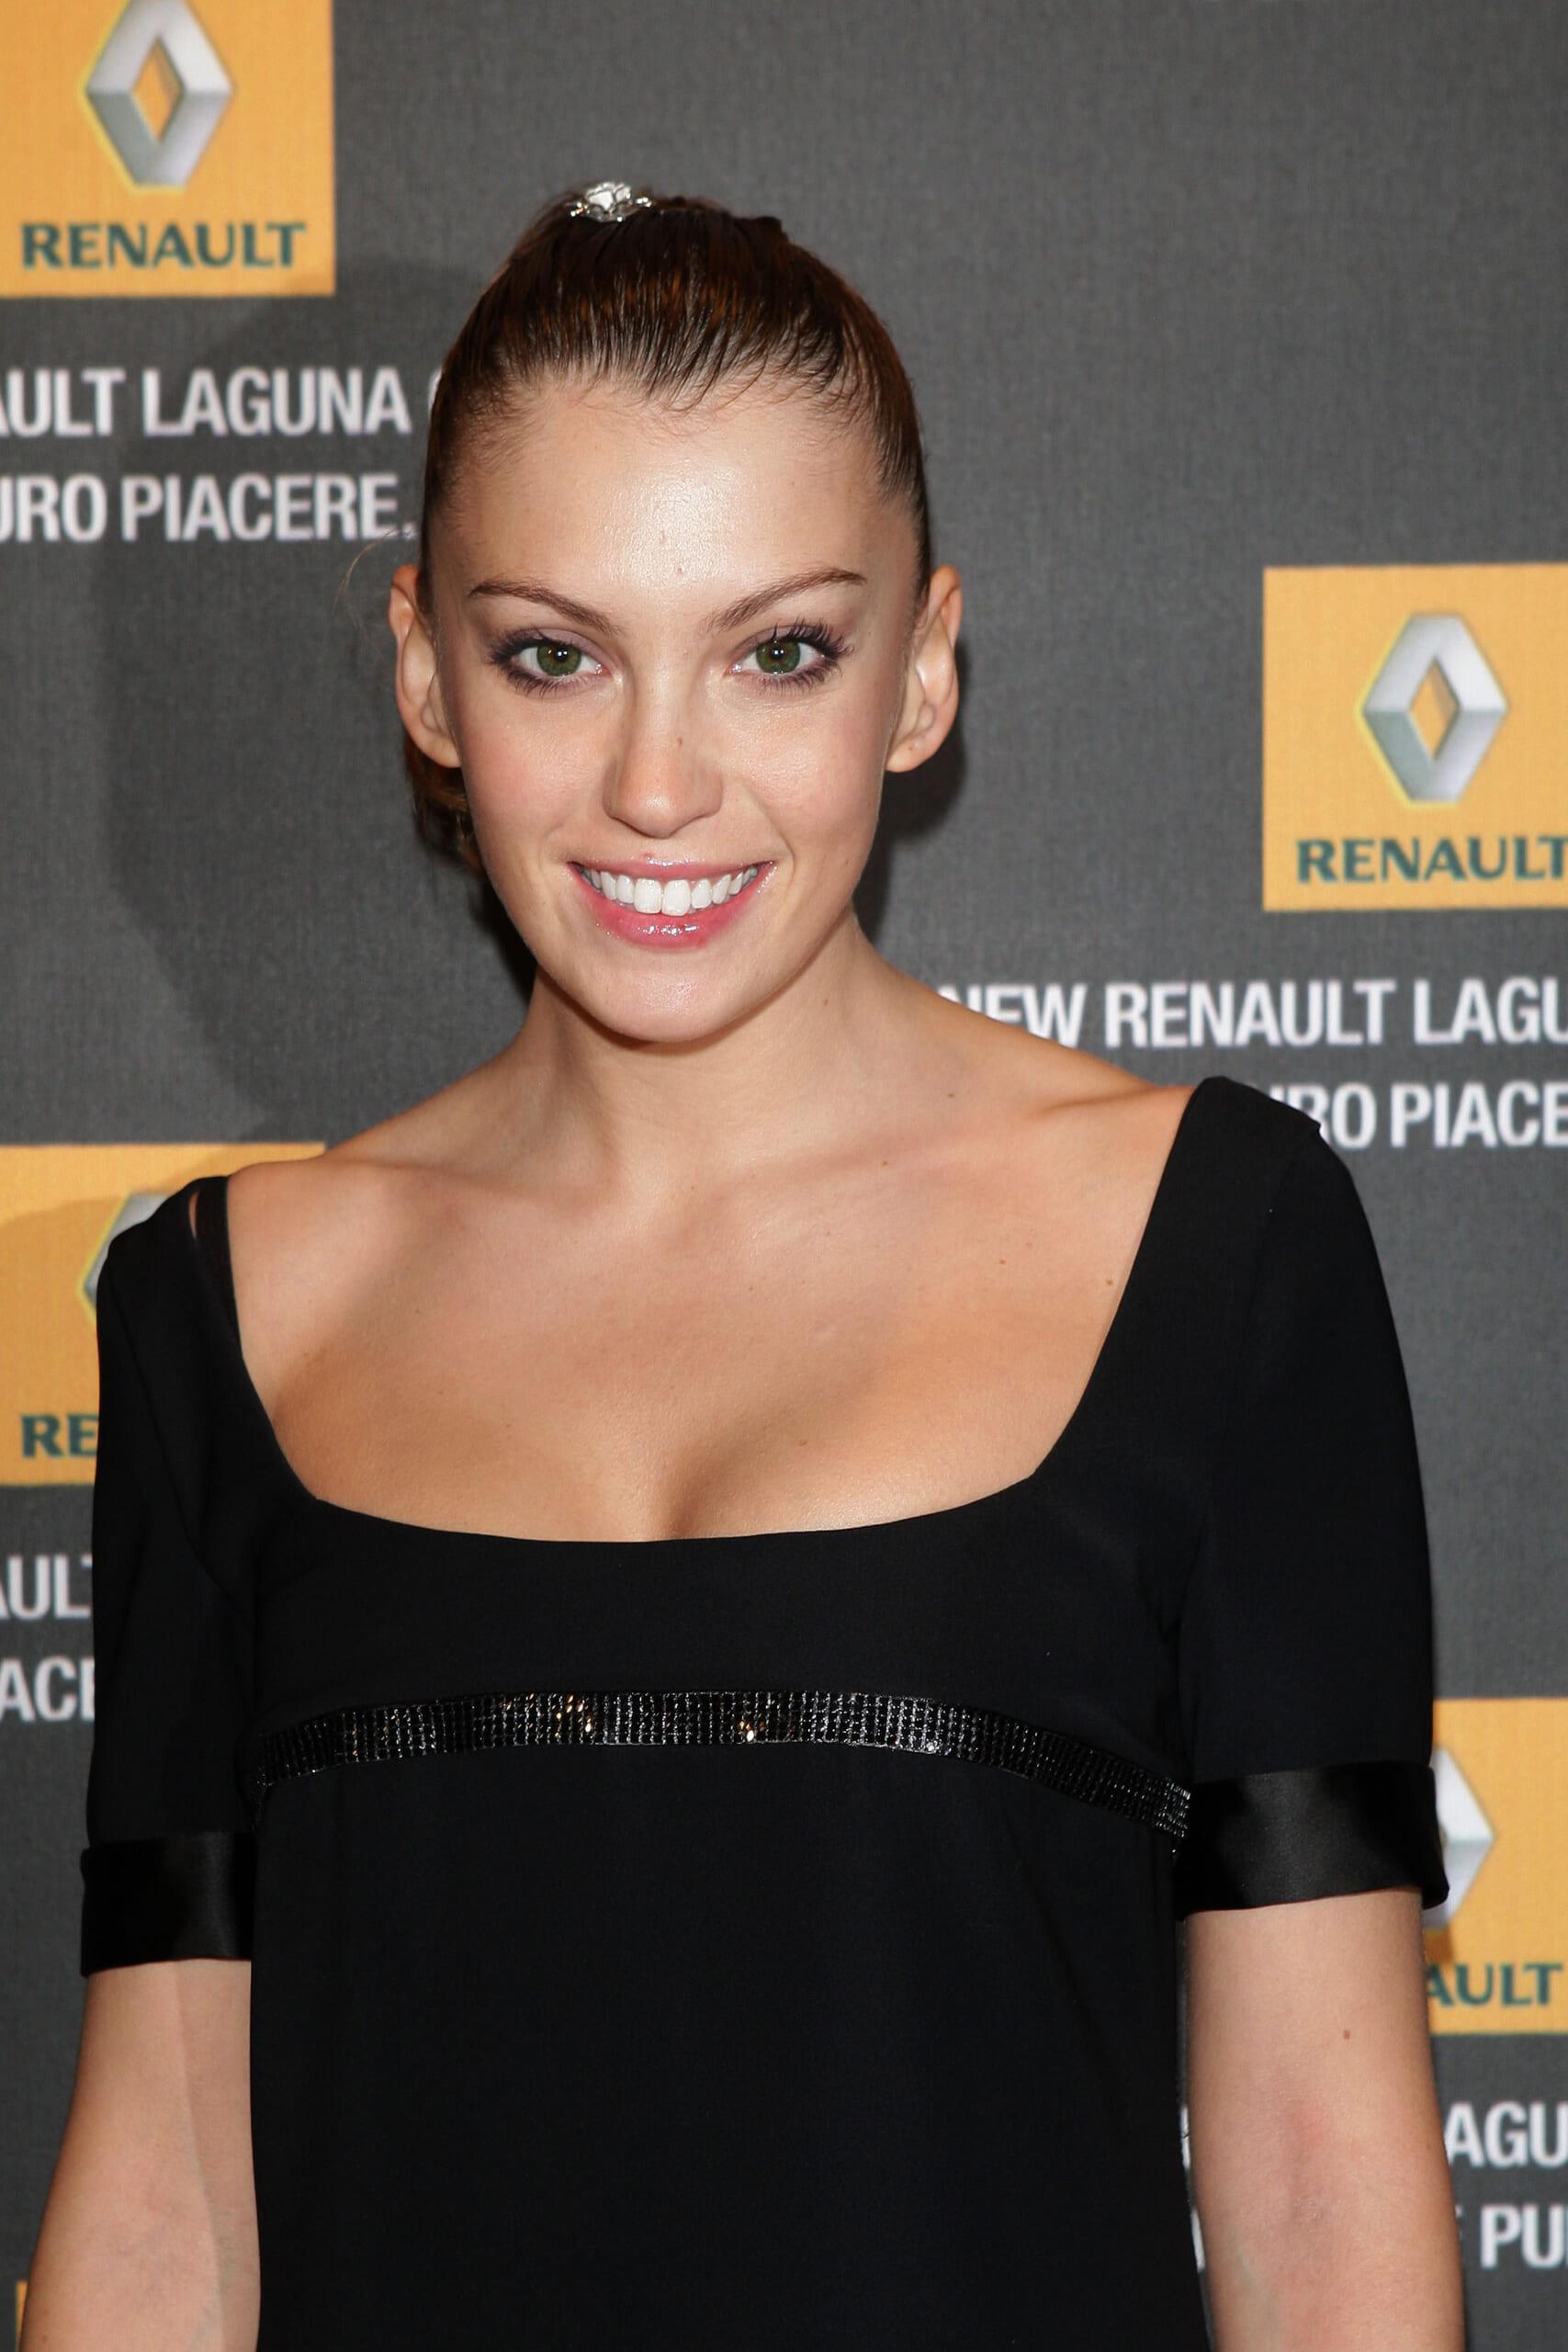 Roberta Mancino